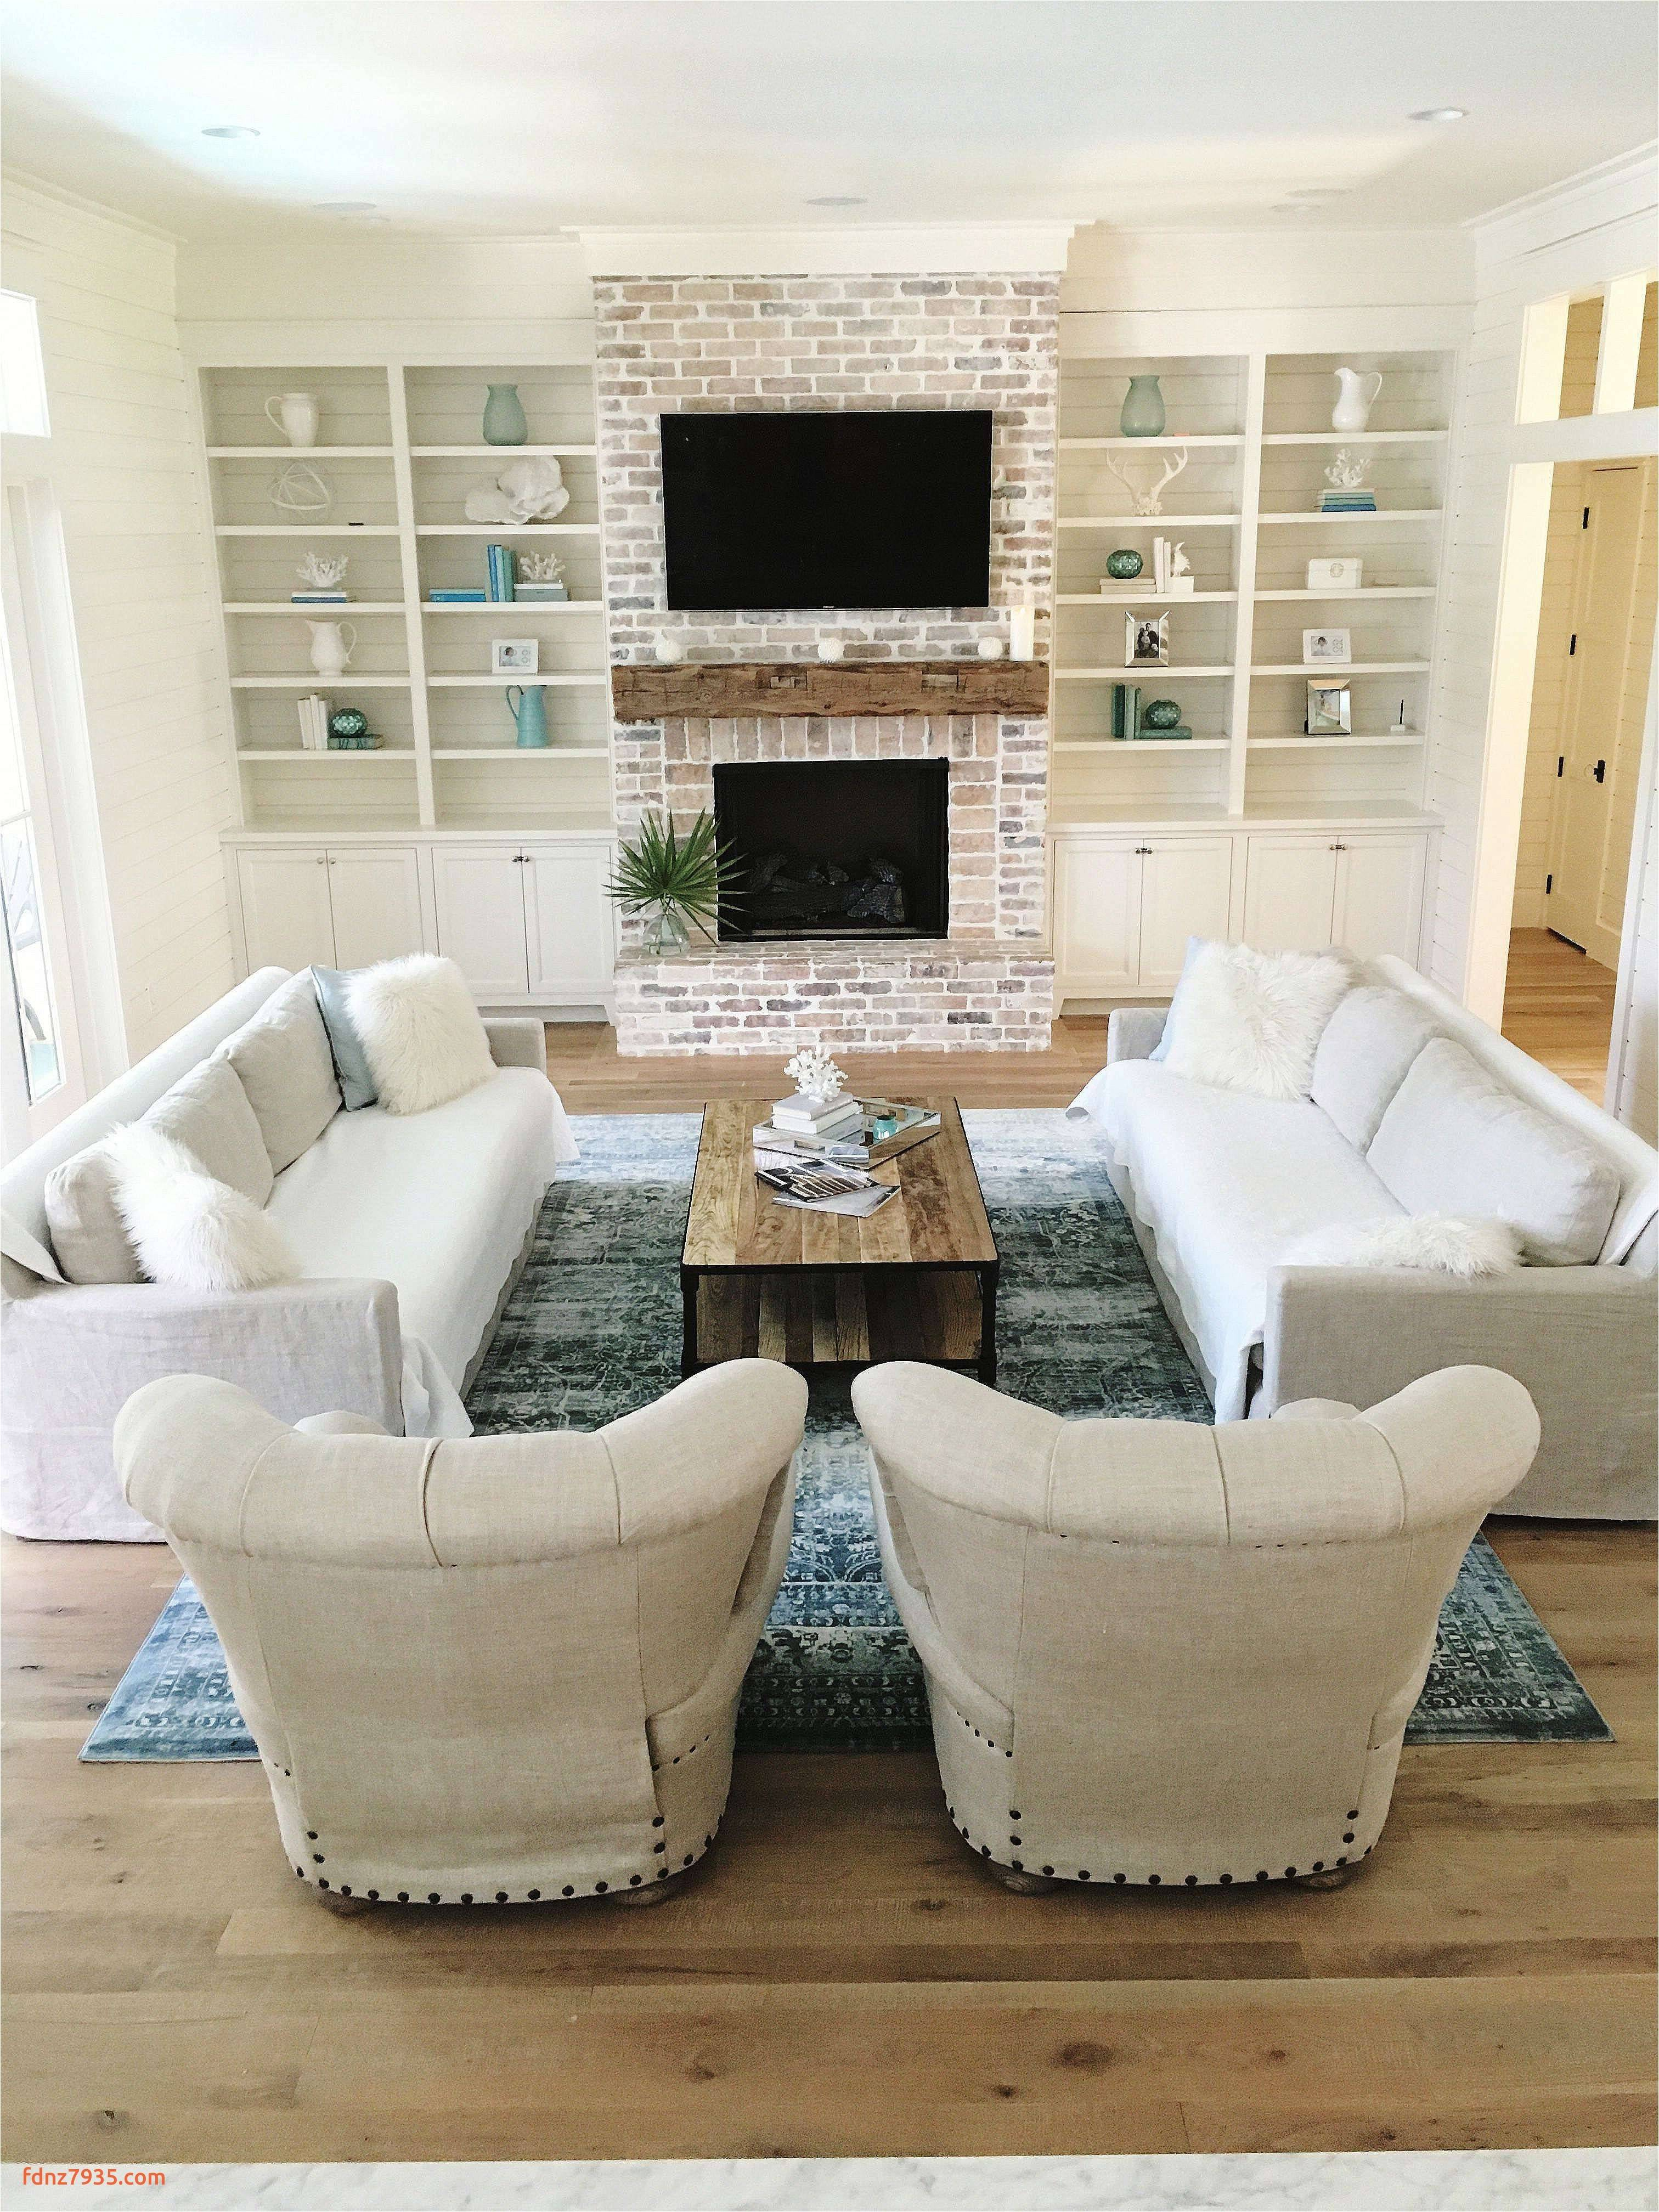 sofa ideas modern living room furniture new gunstige sofa macys furniture 0d of sofa ideas